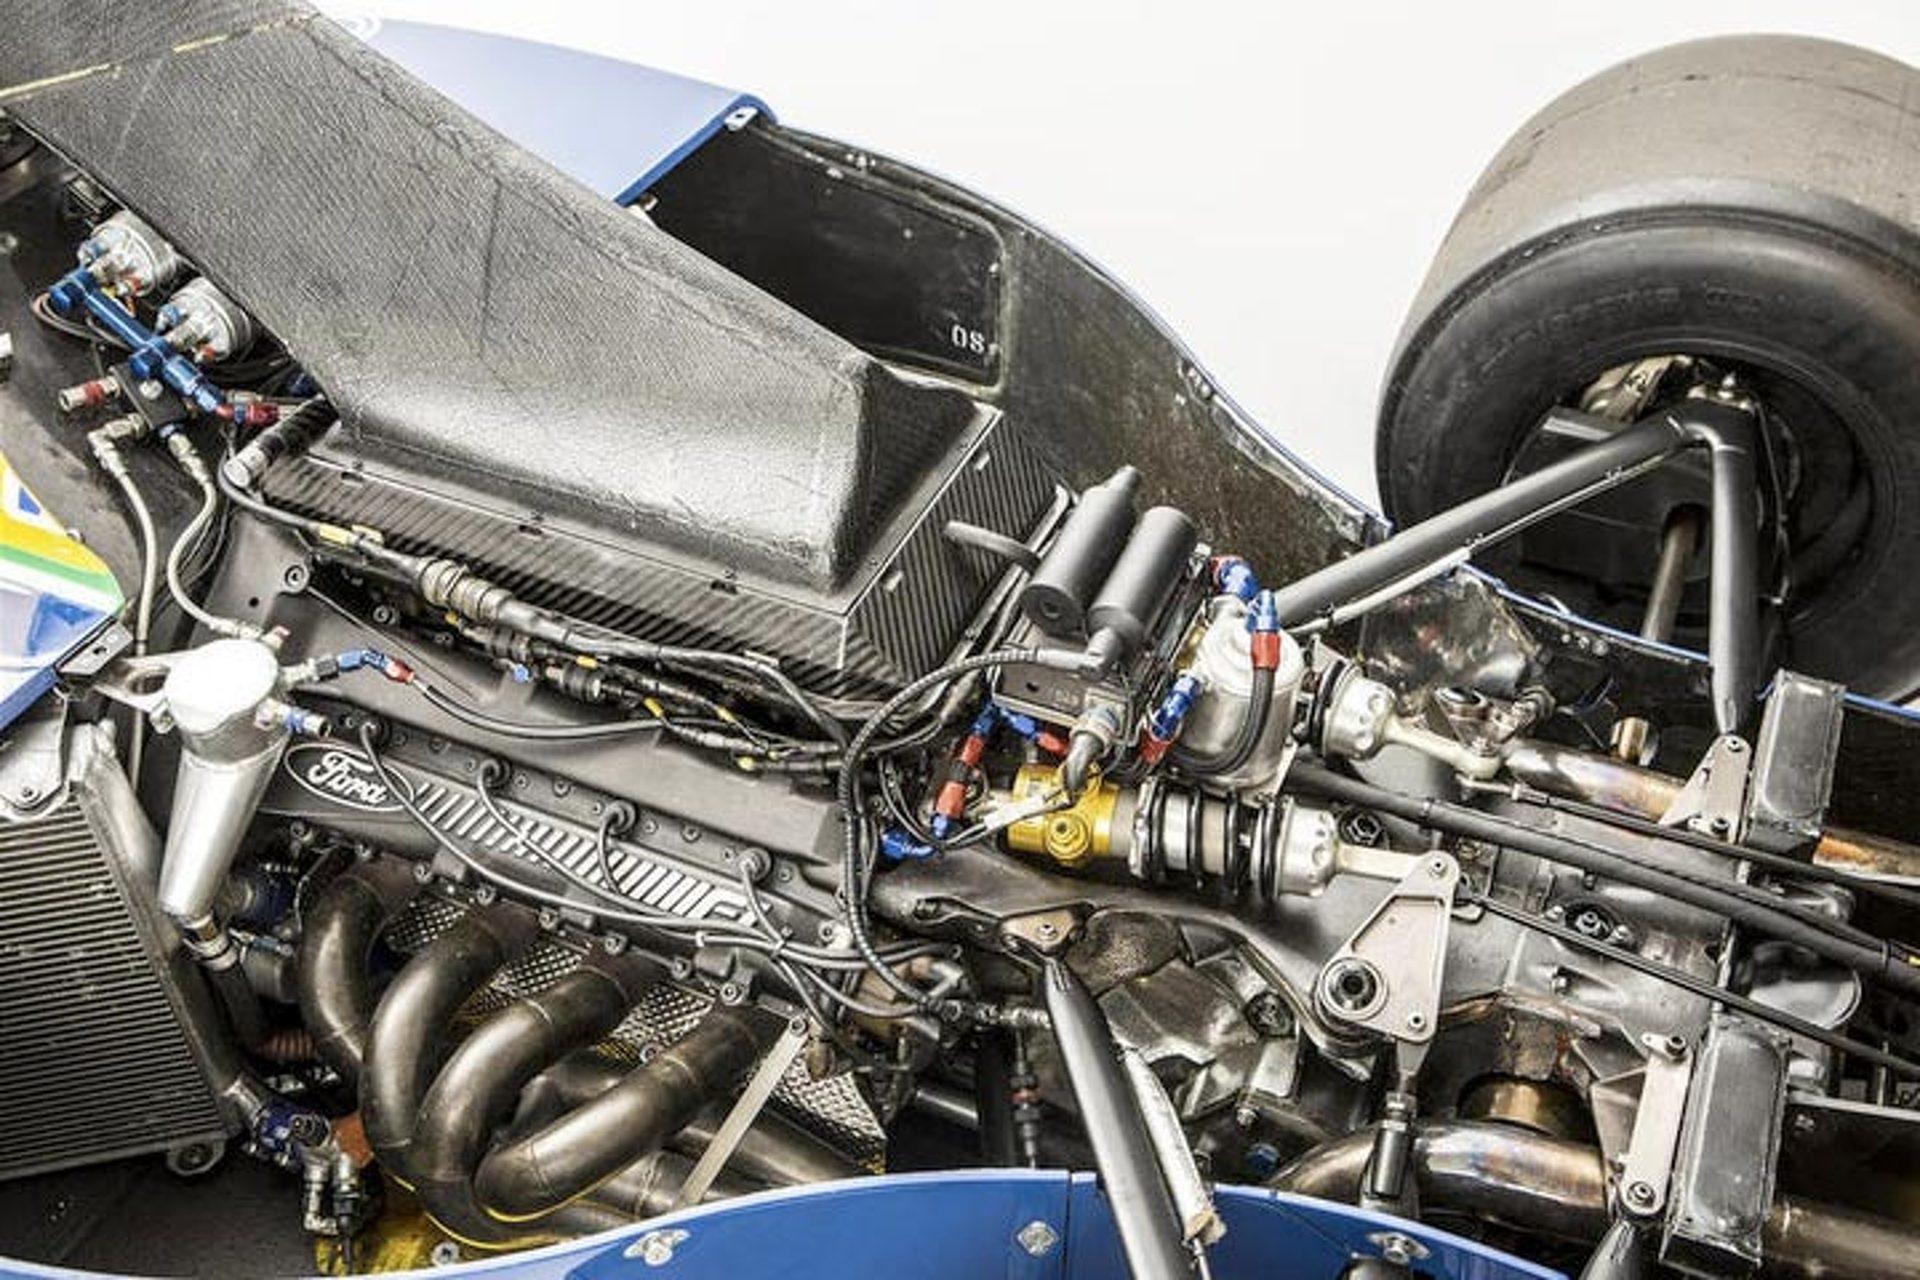 Buy Michael Schumacher's First Podium Finish F1 Car